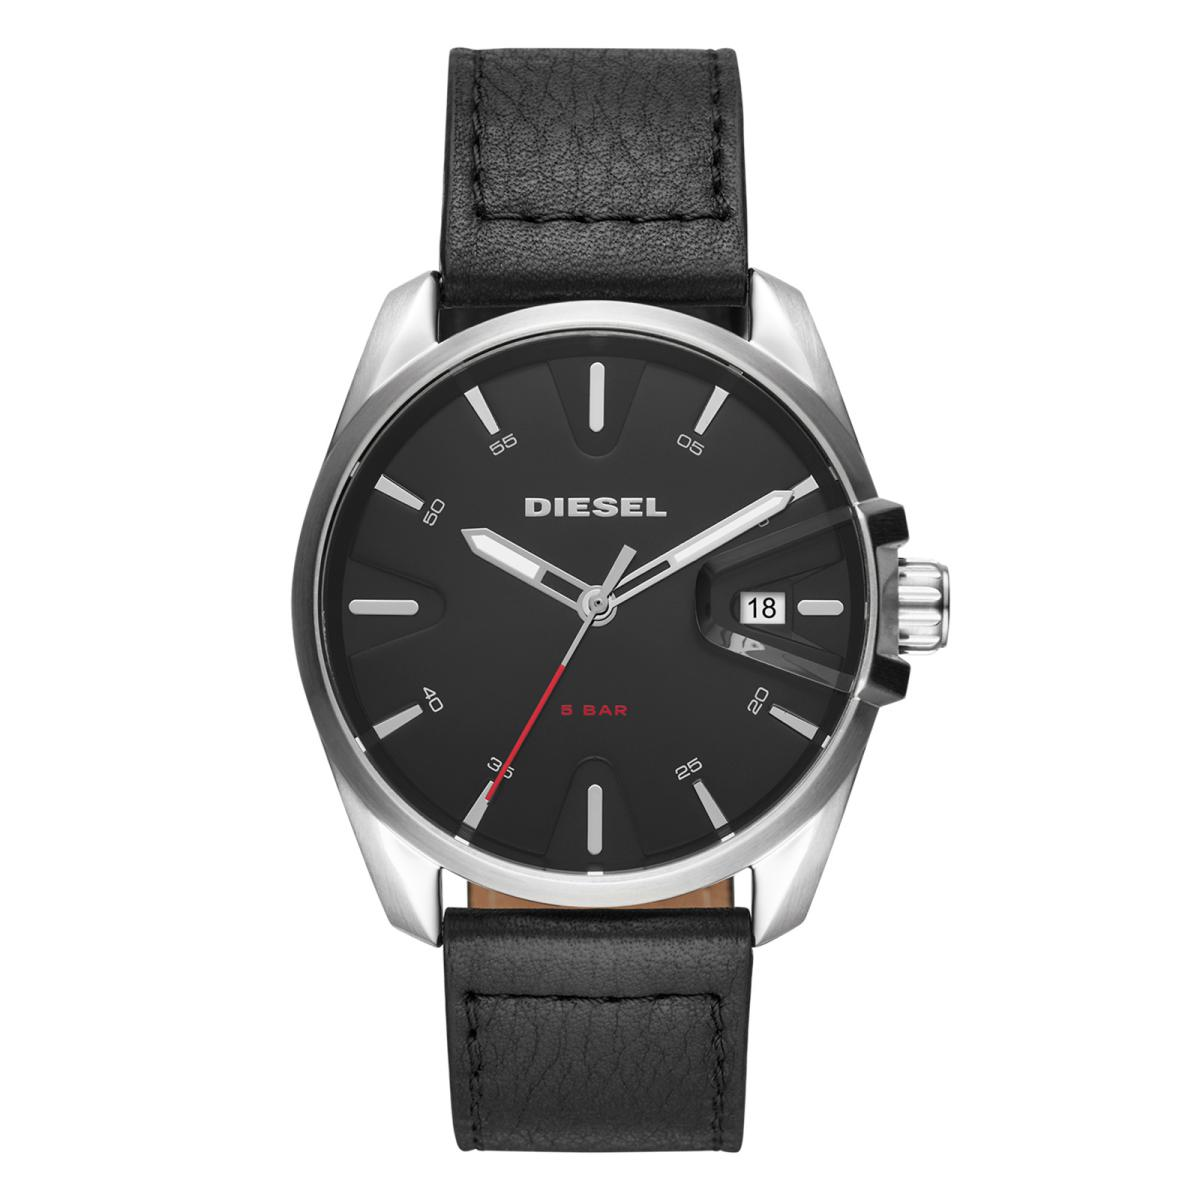 a9b631b9be34 Reloj Diesel - DZ1862 - Hombre - Time Square